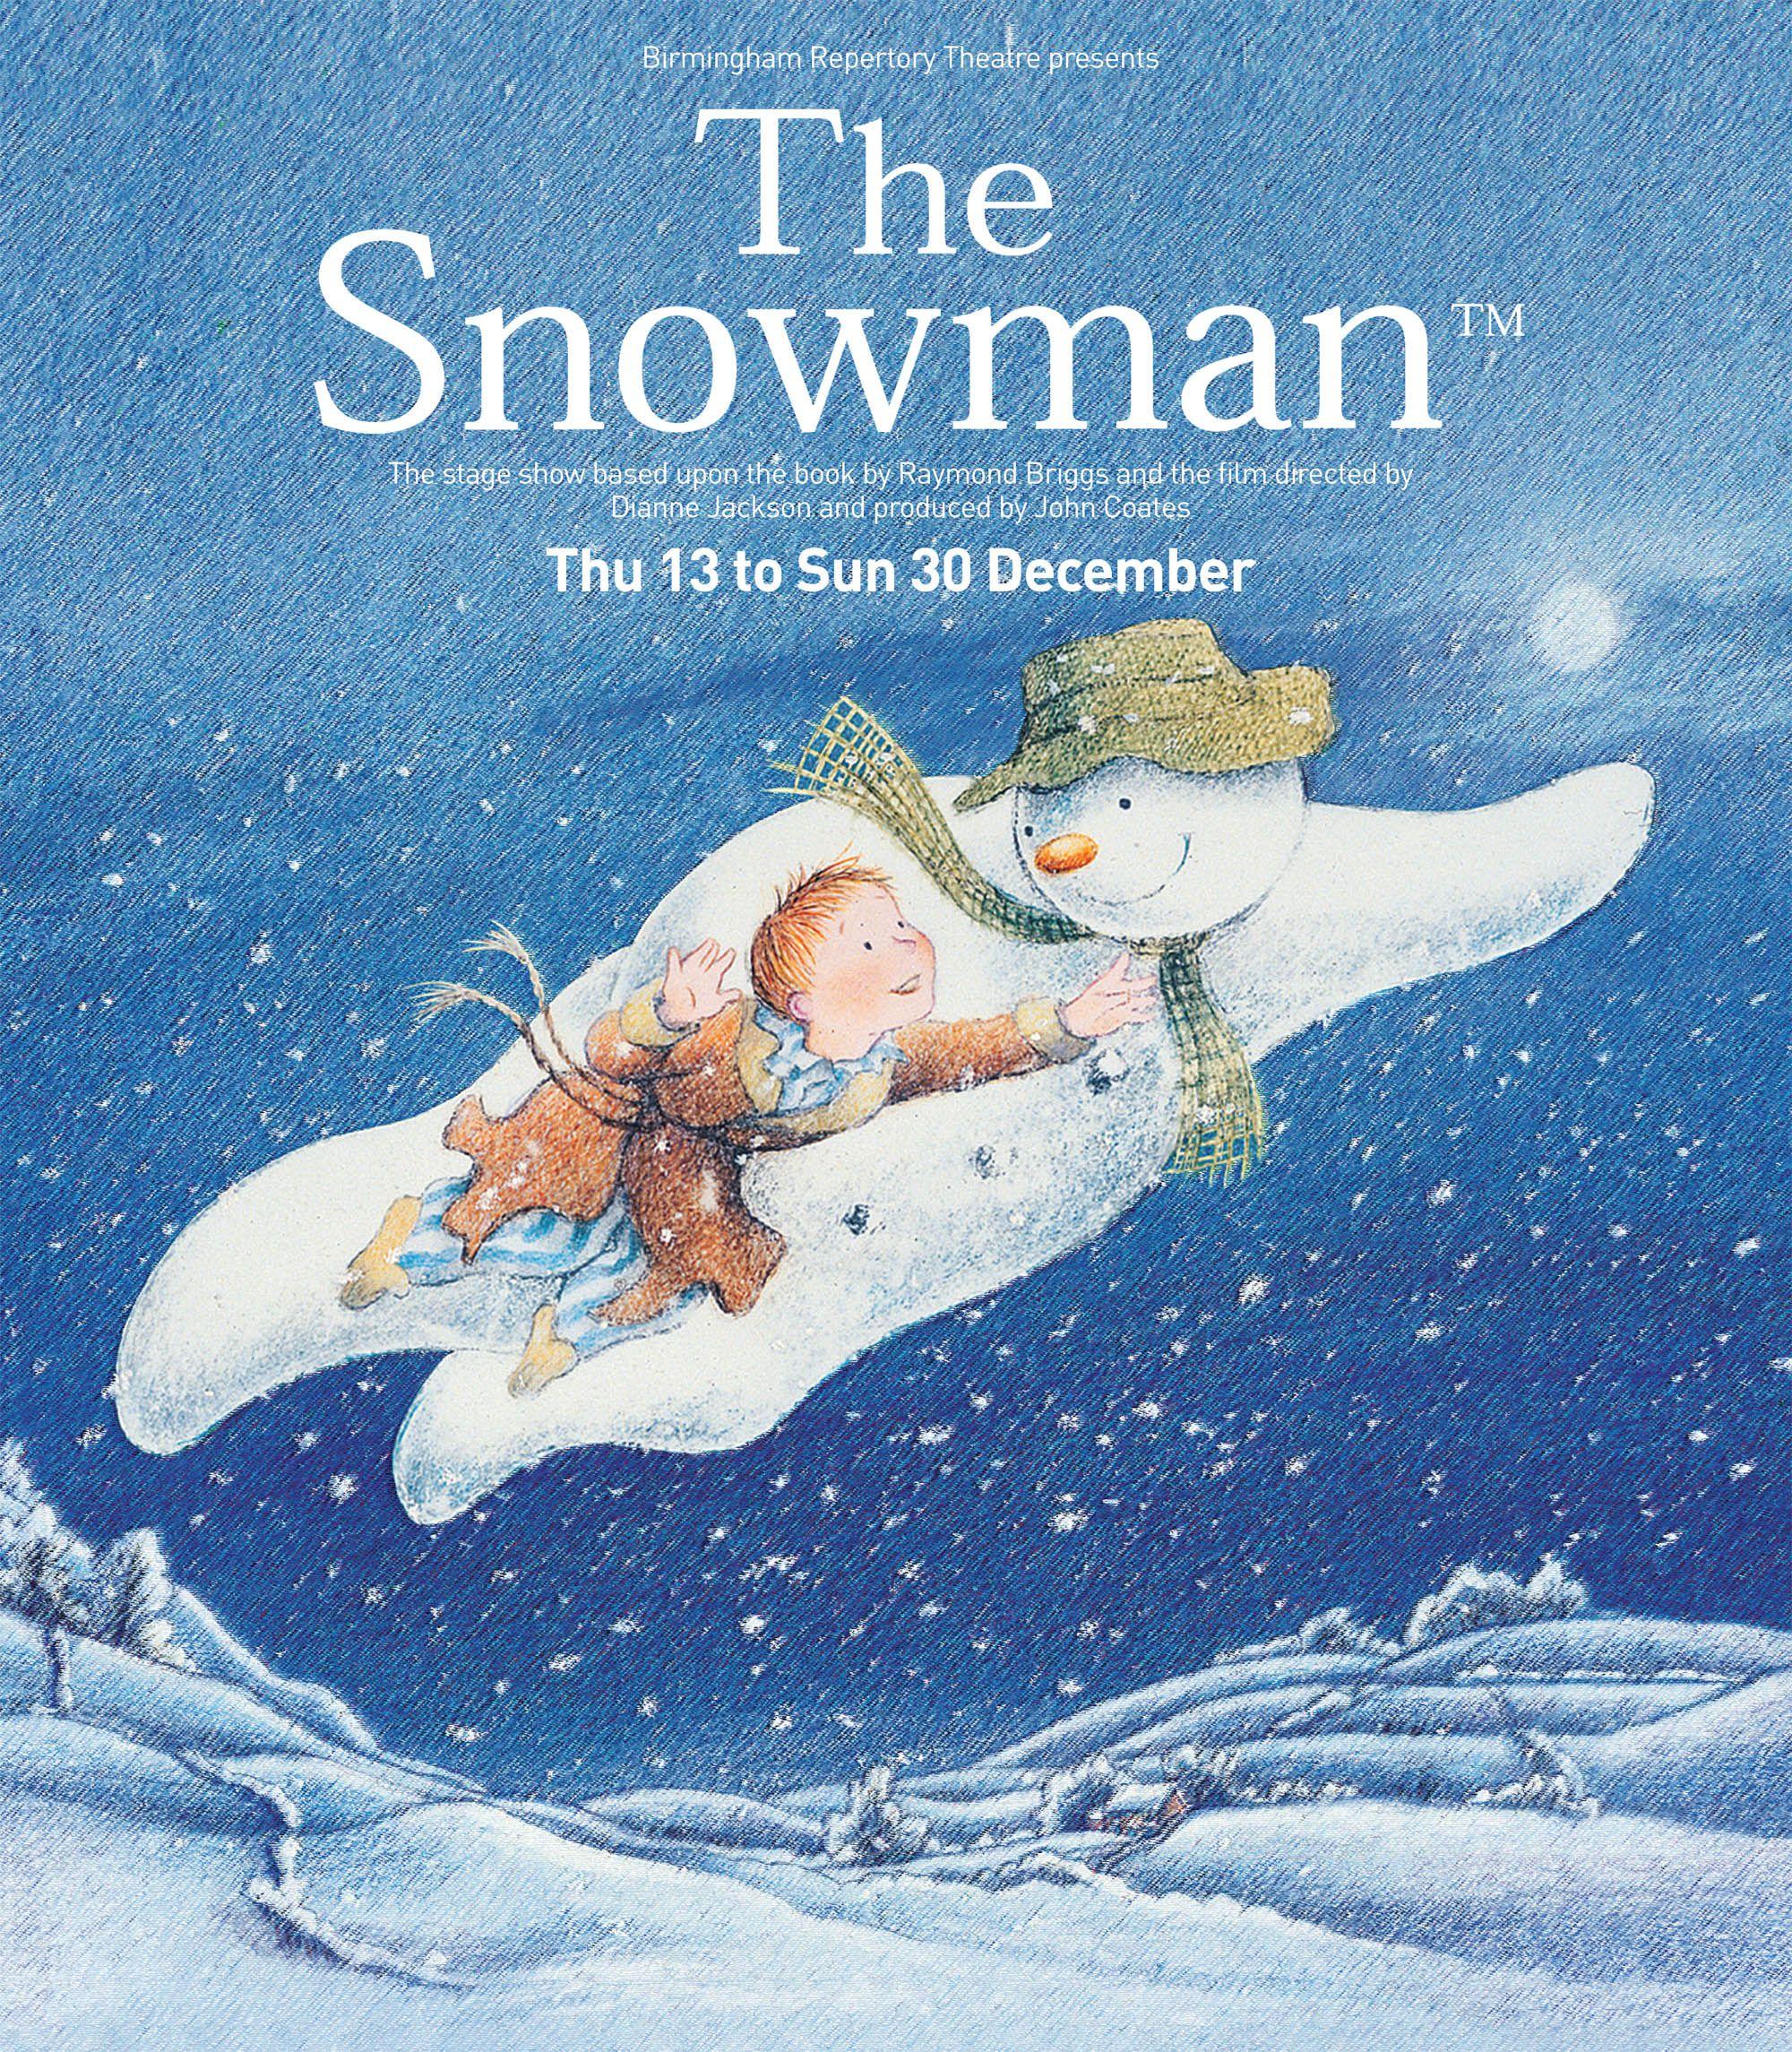 Raymond Briggs The Snowman Christmas Tree Decorations: The Snowman - Videos9.net